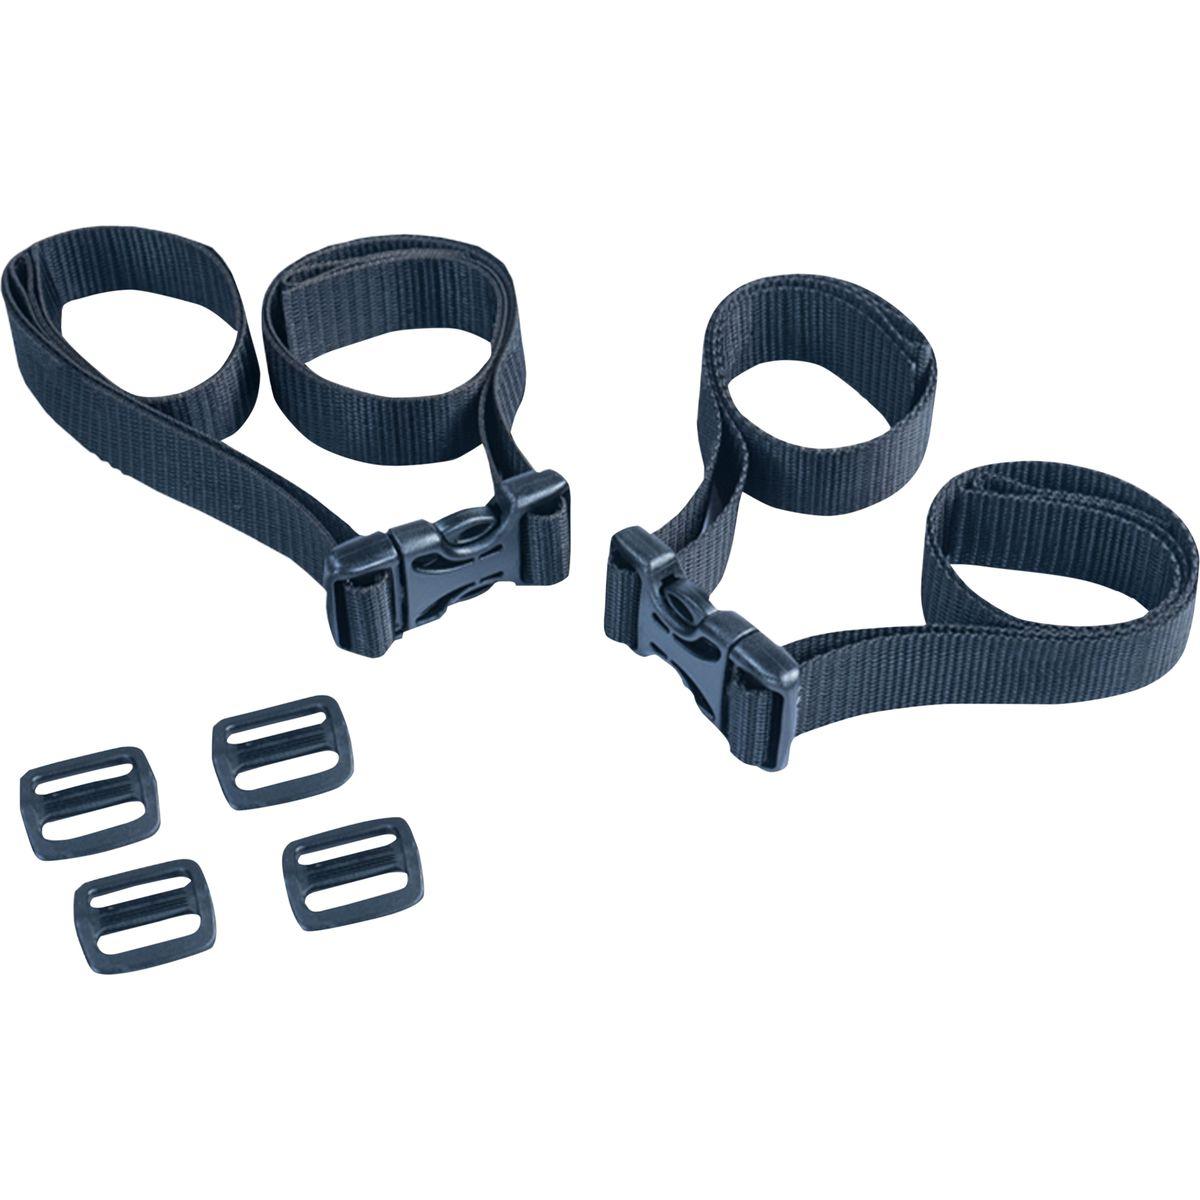 Hyperlite Mountain Gear Pack Accessory Straps